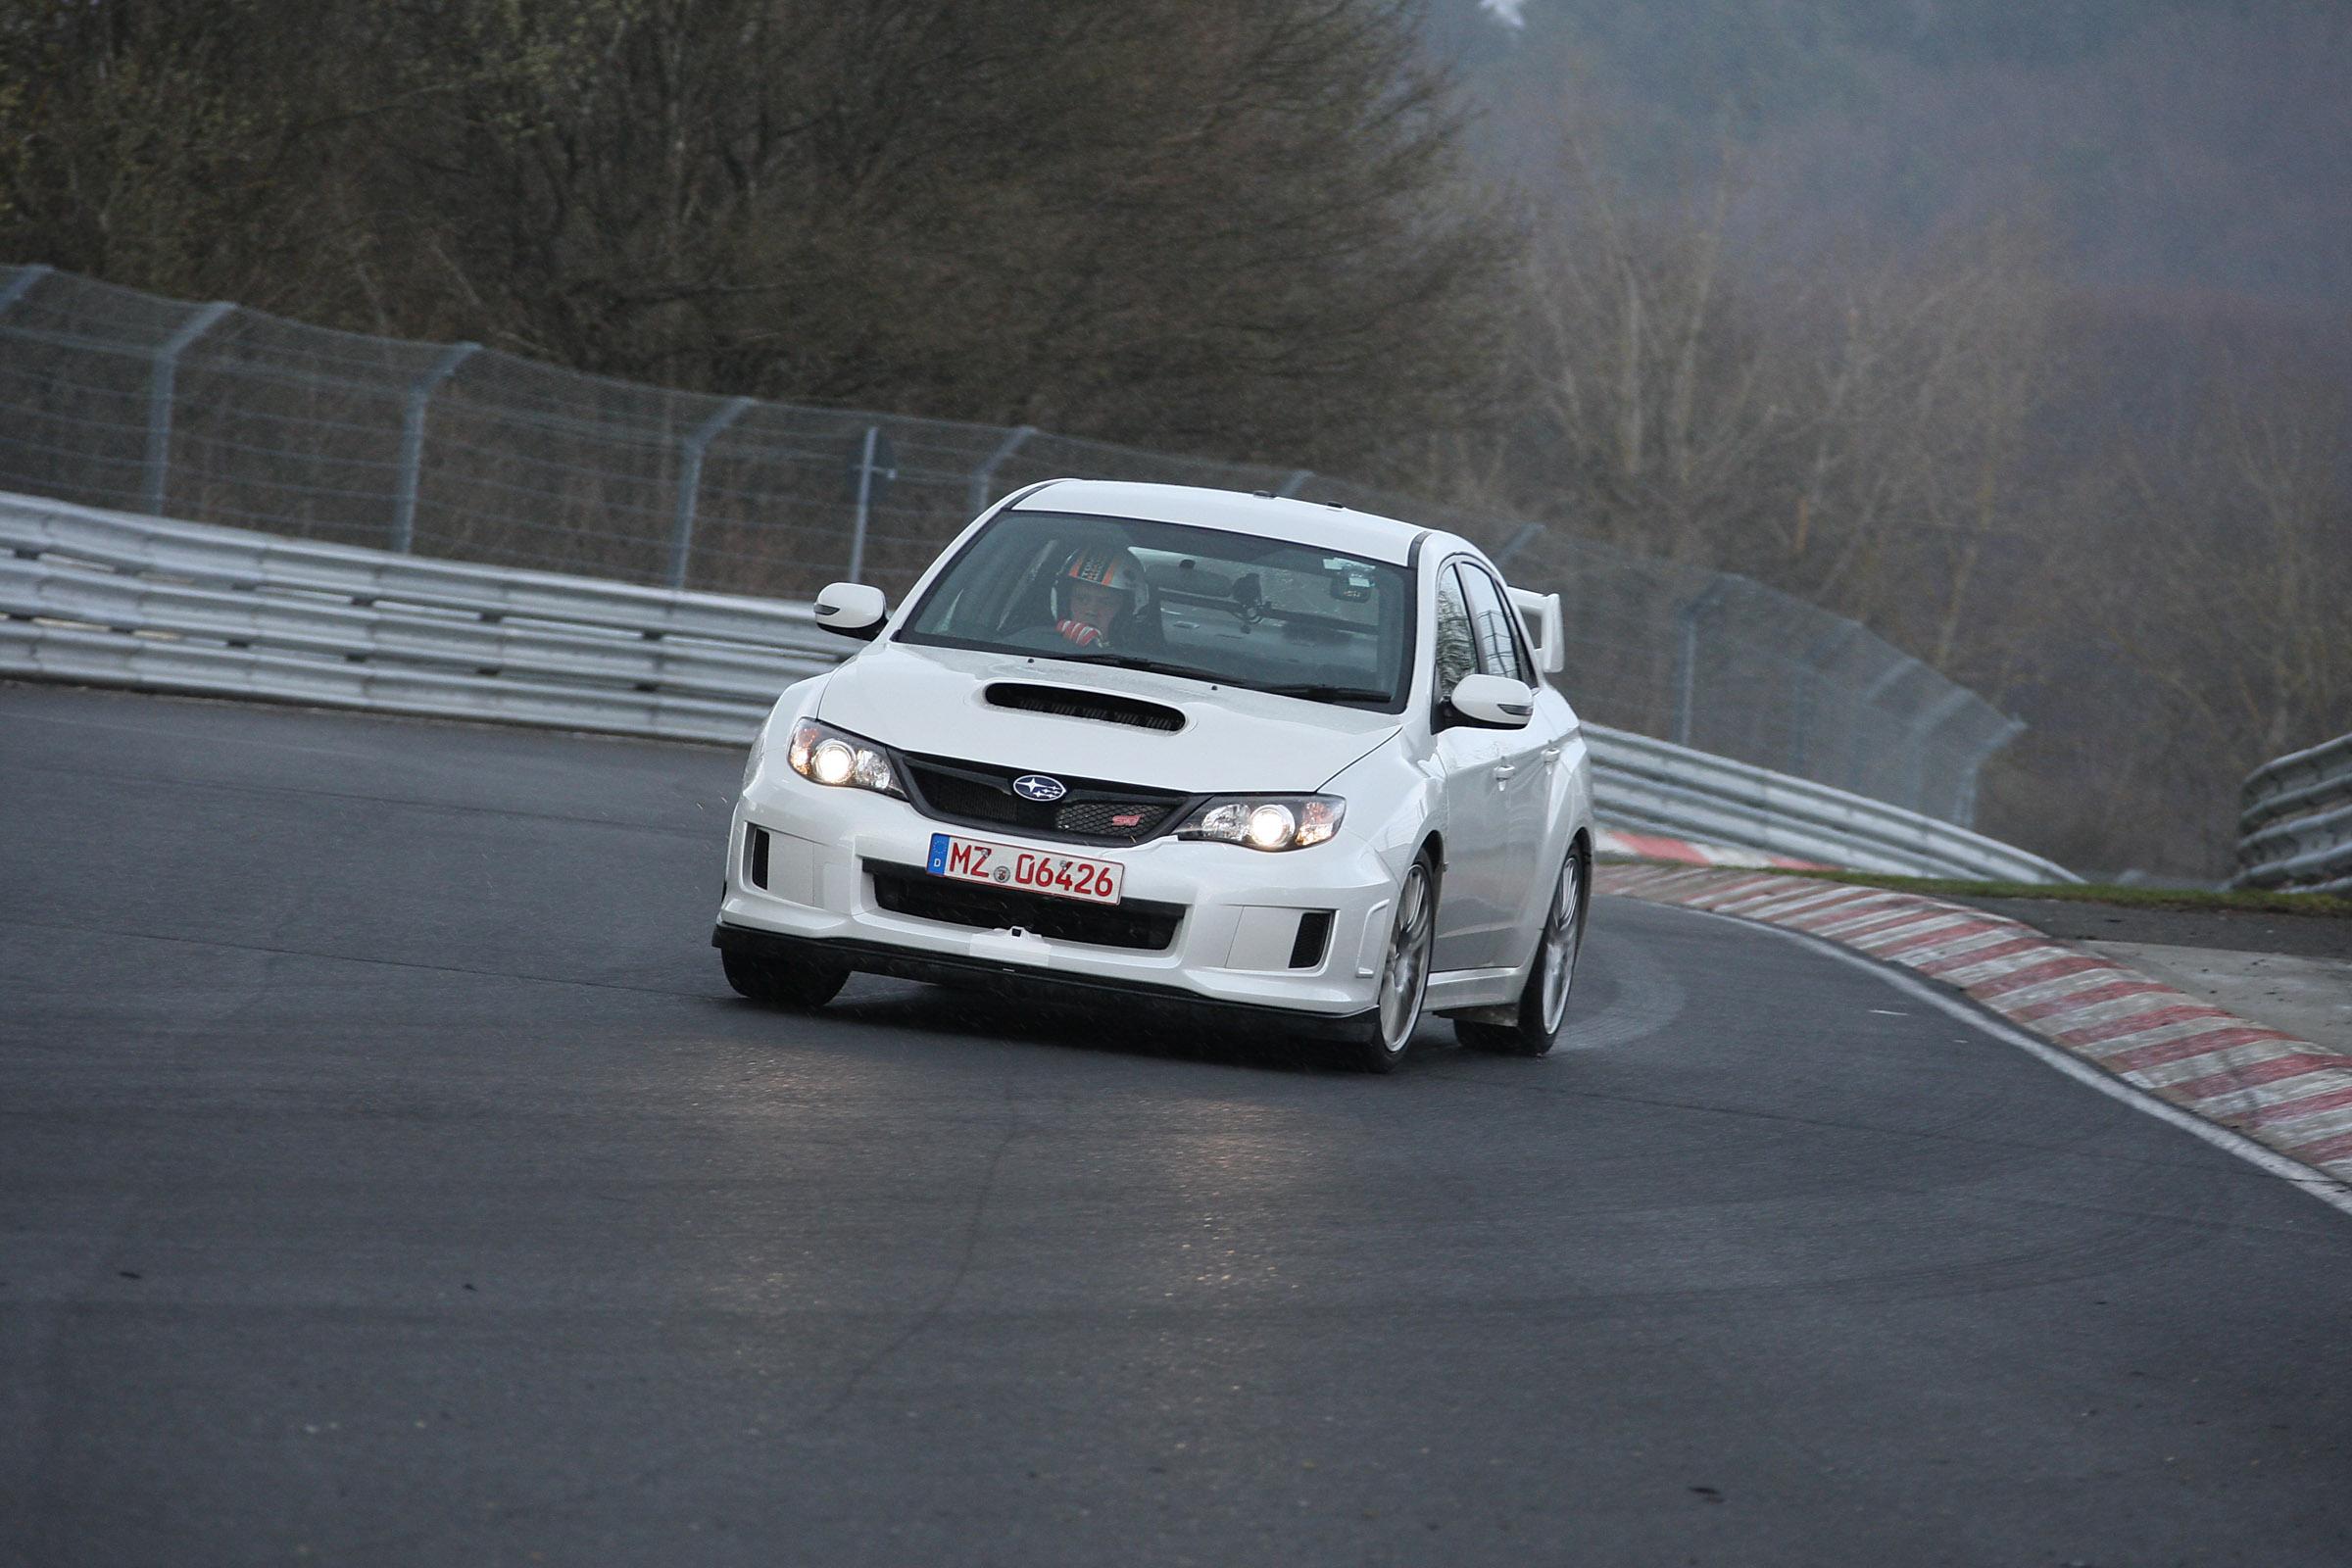 2011 Subaru WRX STi седан испытания на Нюрбургринге - фотография №2